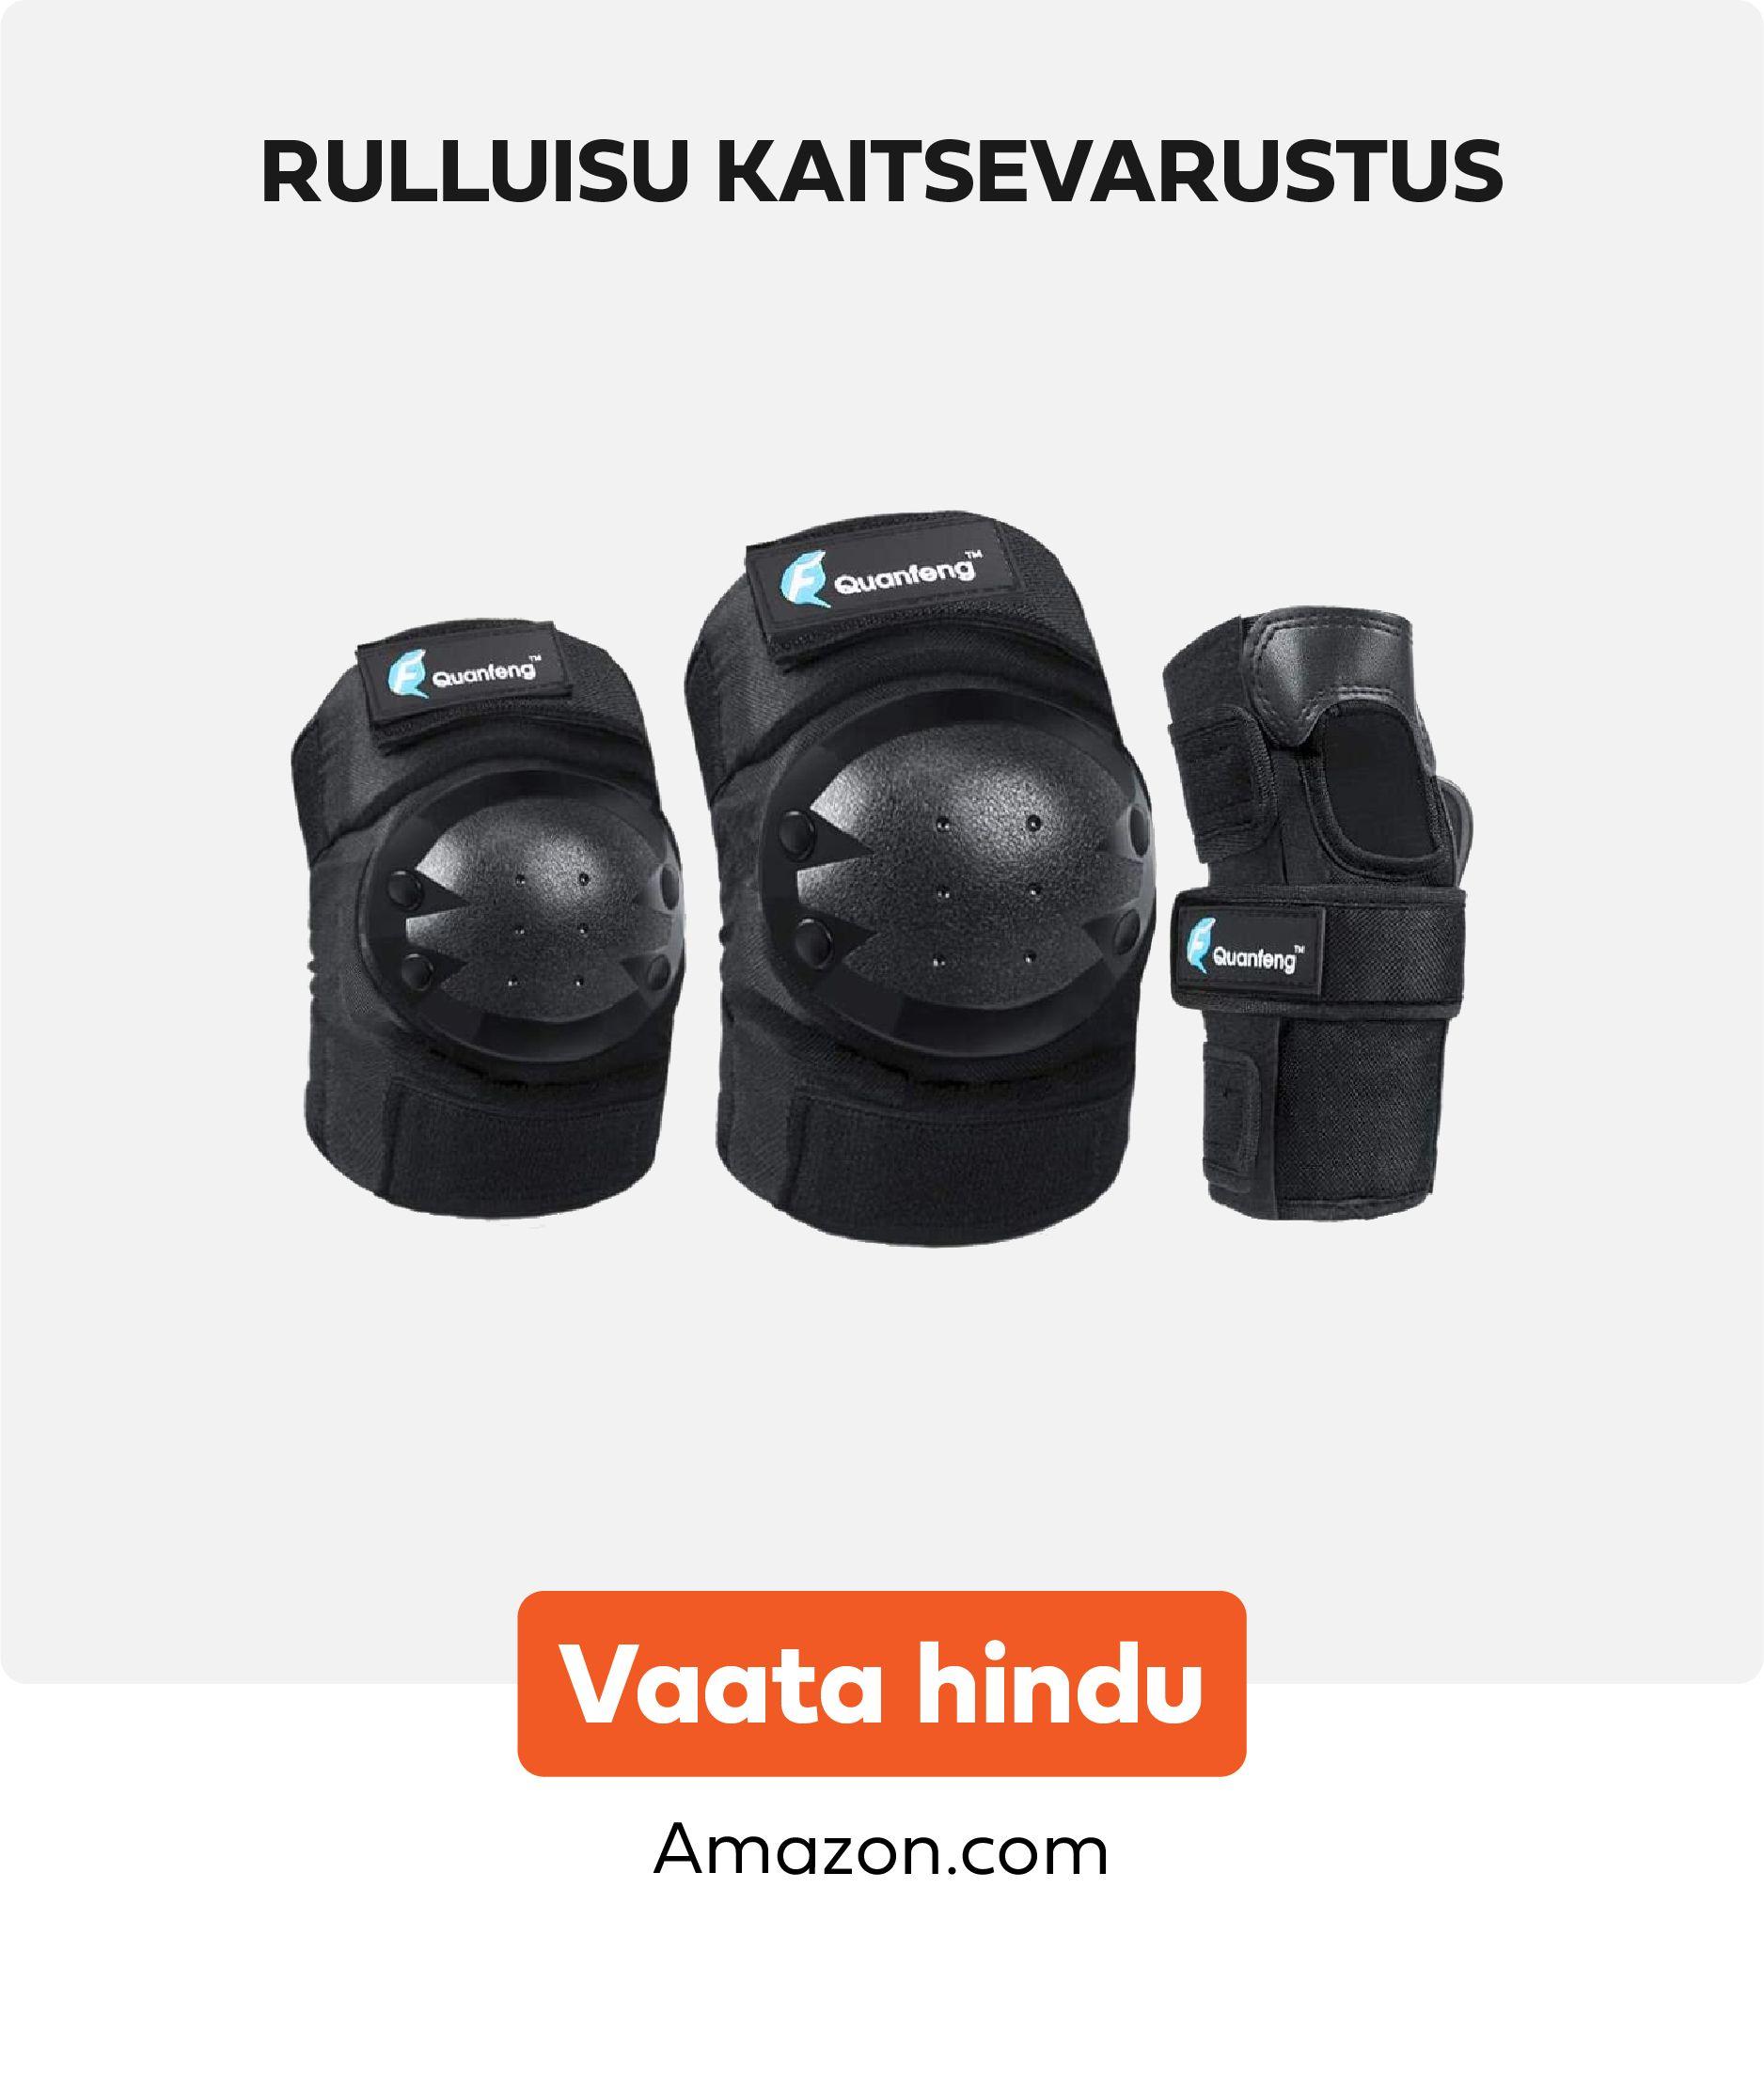 RULLUISU KAITSEVARUSTUS